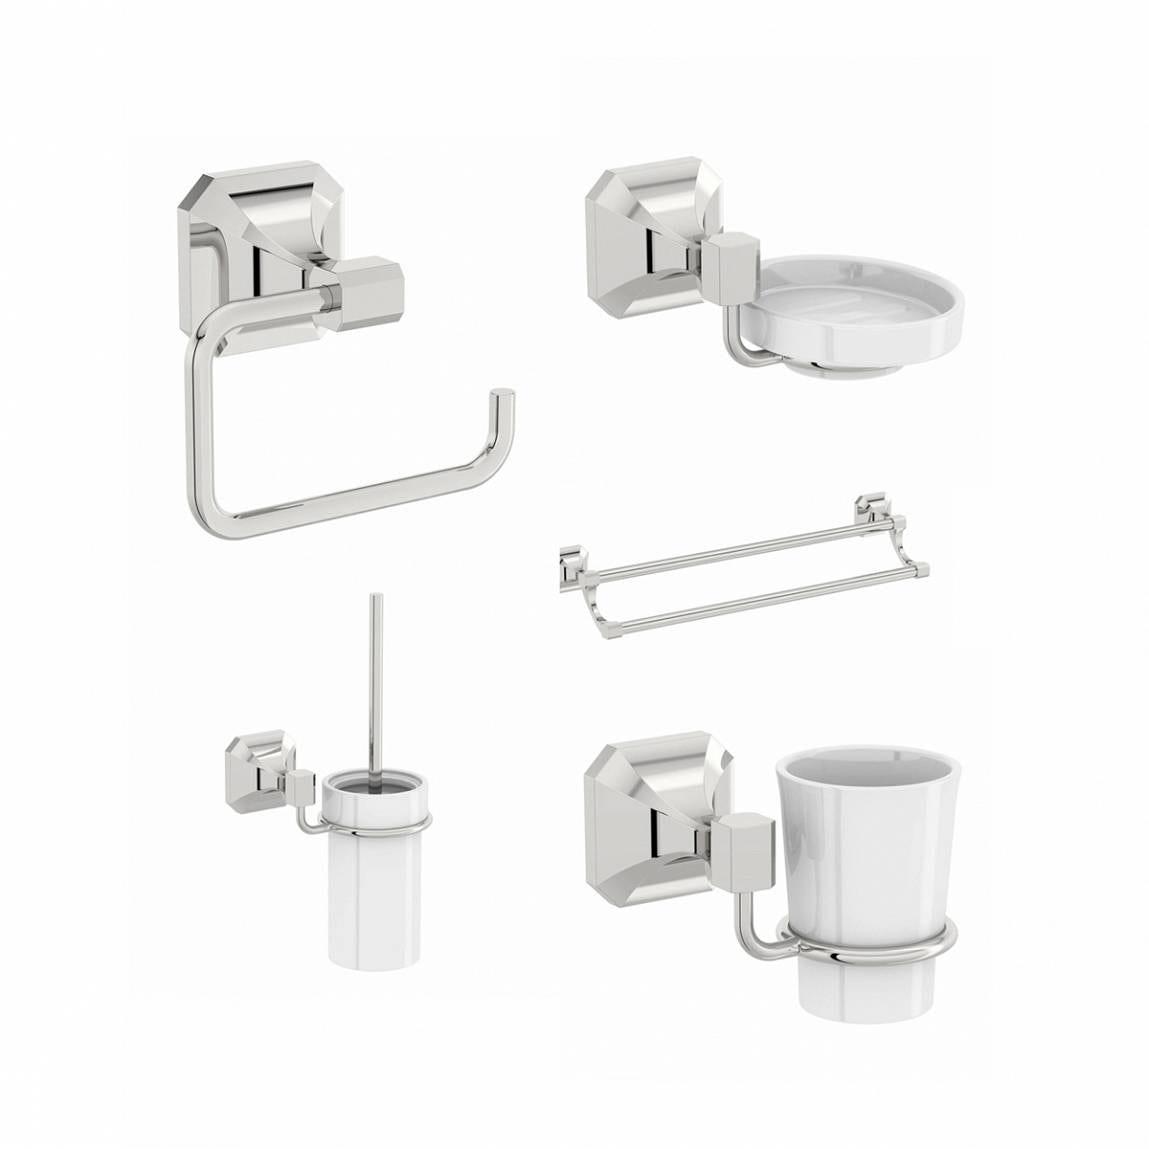 The Bath Co. Camberley family bathroom accessory set